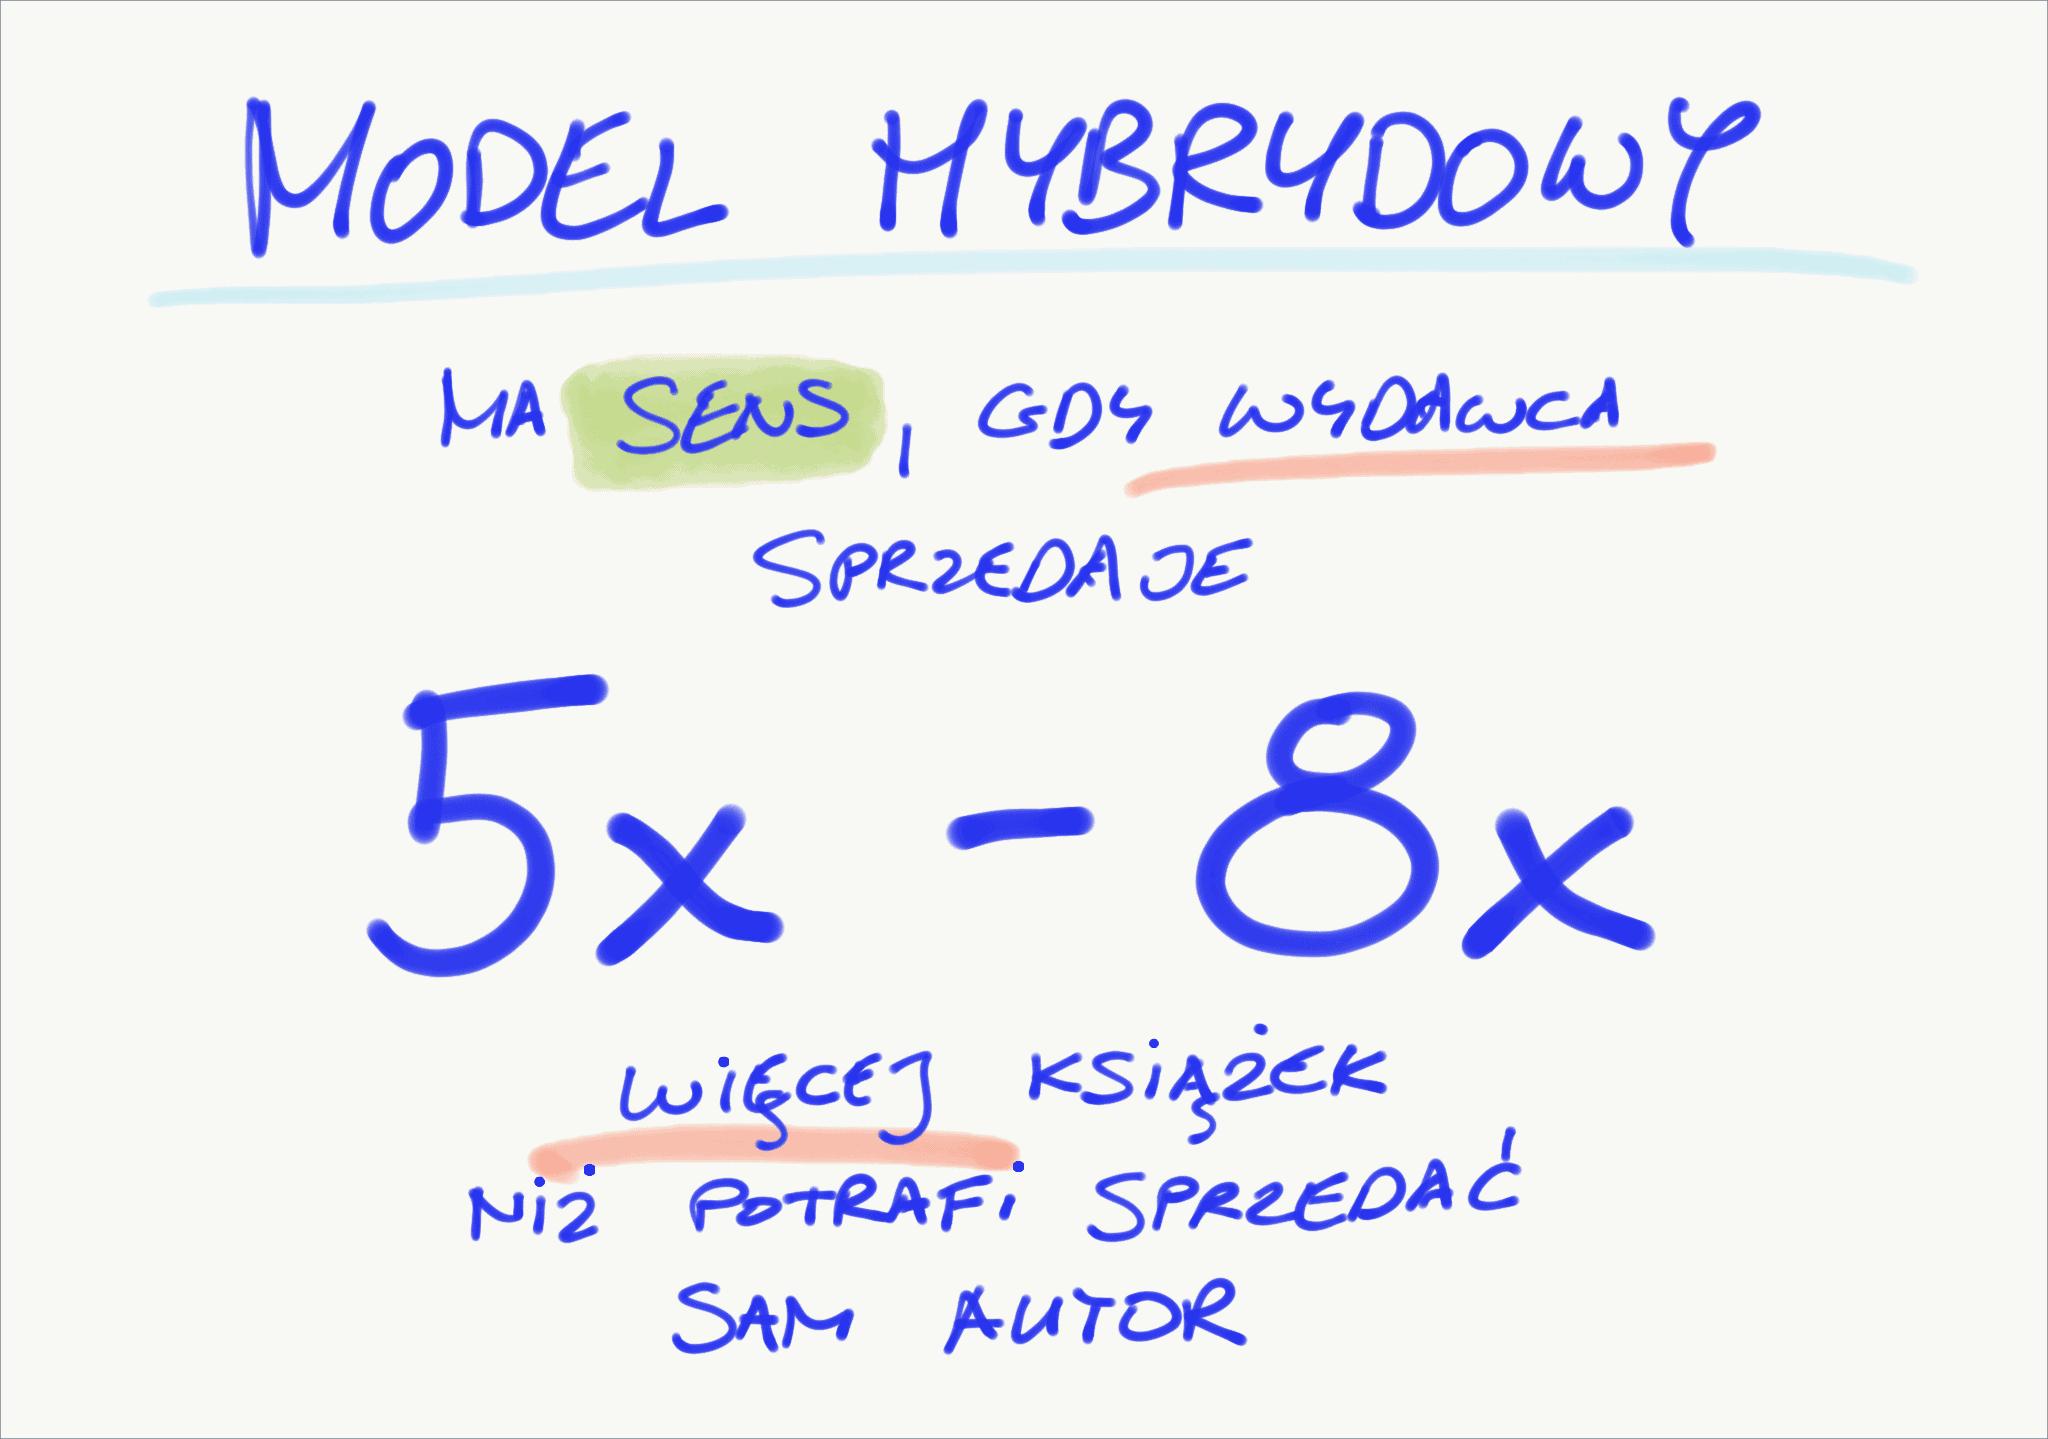 Sens modelu hybrydowego